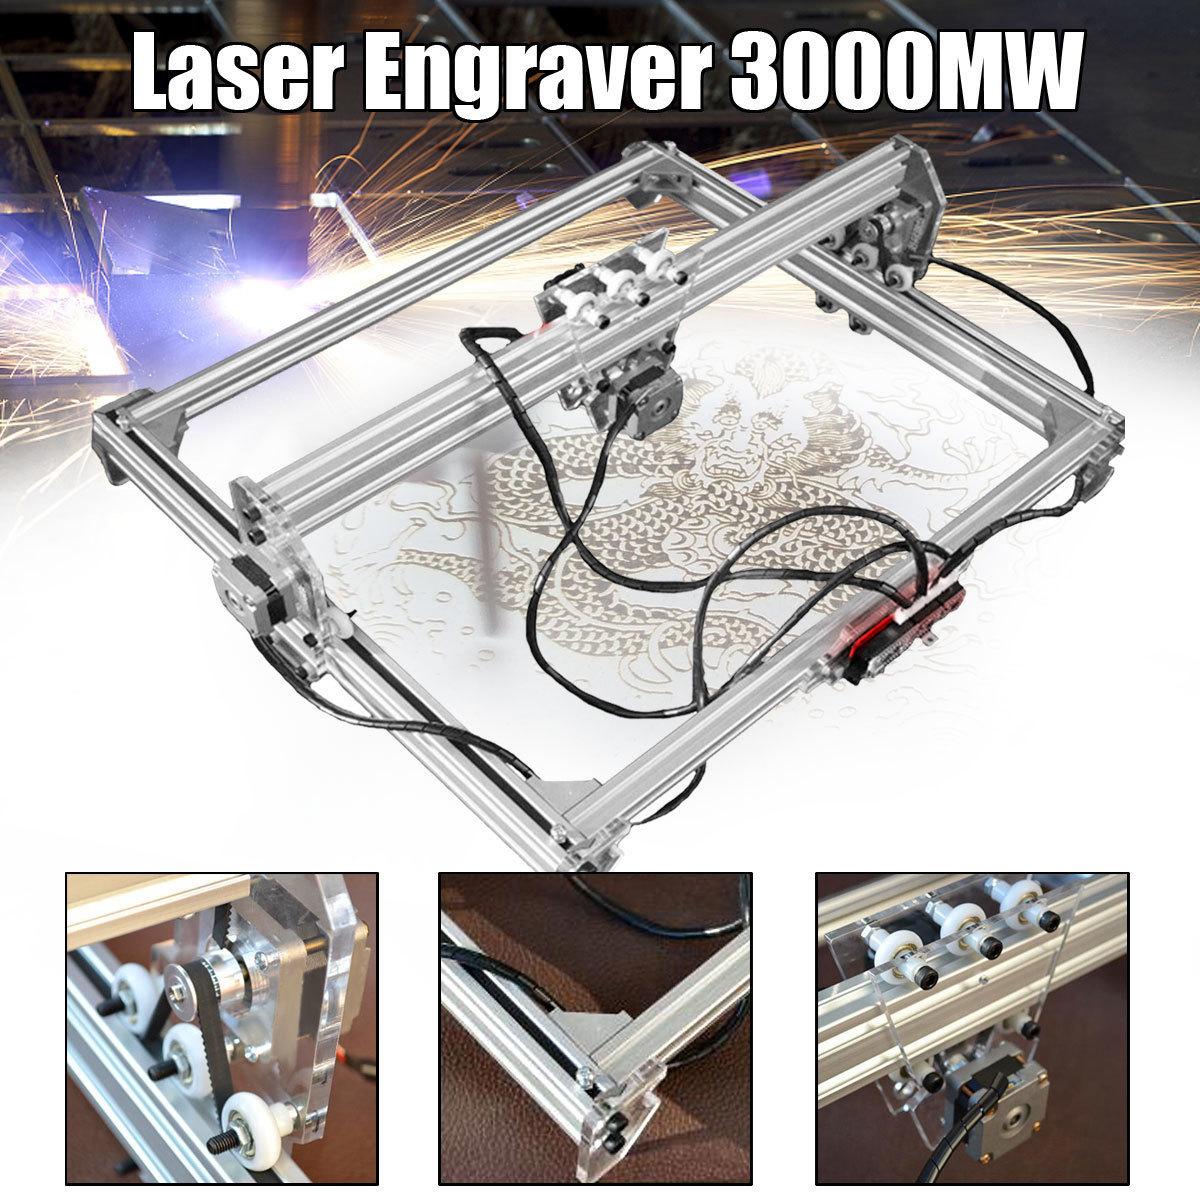 50*65cm Mini 3000mw Blue CNC Laser Engraving Machine 2axis DC 12V DIY Engraver Desktop Wood Router/cutter/printer+ Laser